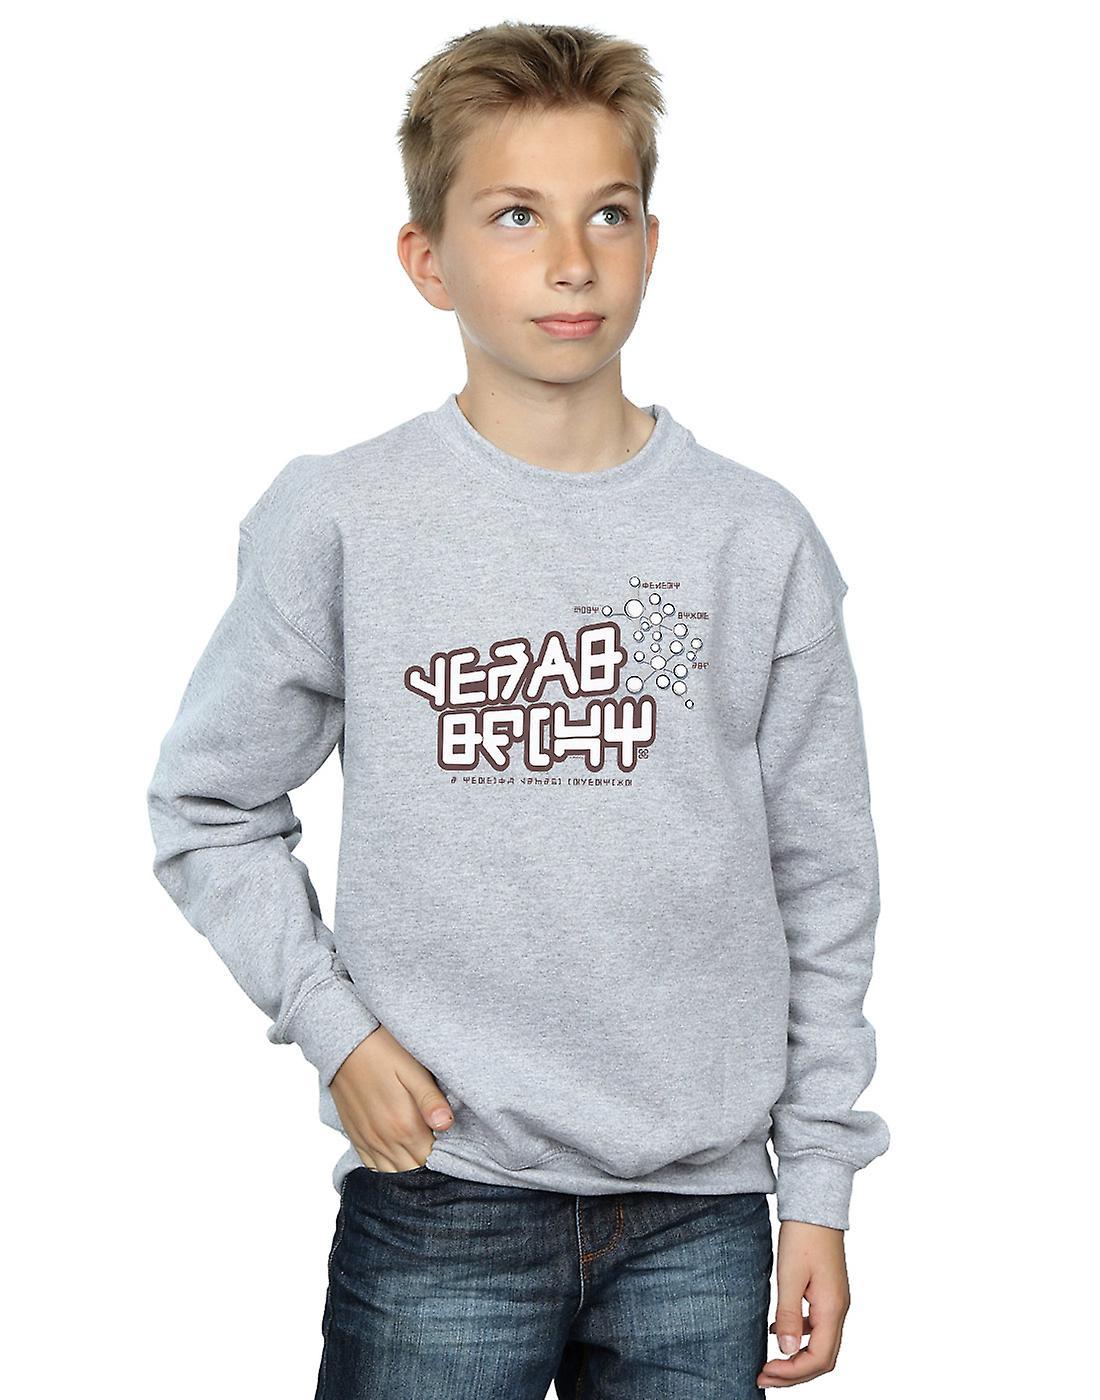 Marvel Boys Guardians Of The Galaxy Star Lord Text Sweatshirt